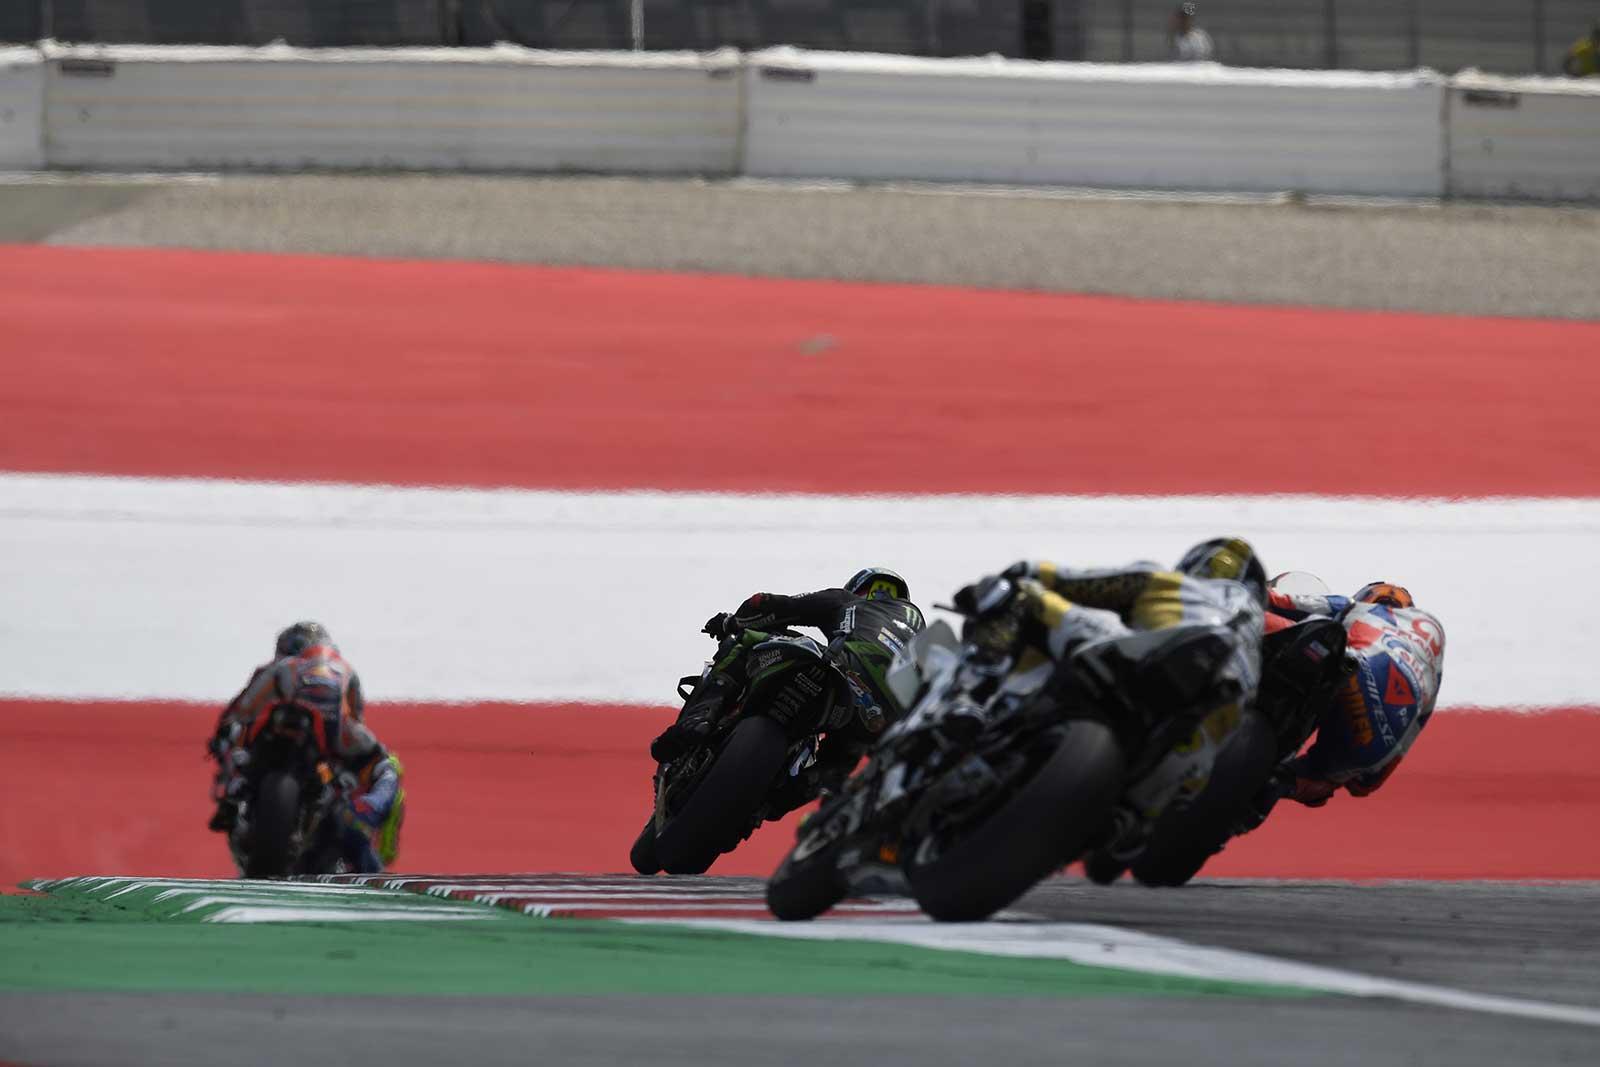 2020 Provisional MotoGP Calender